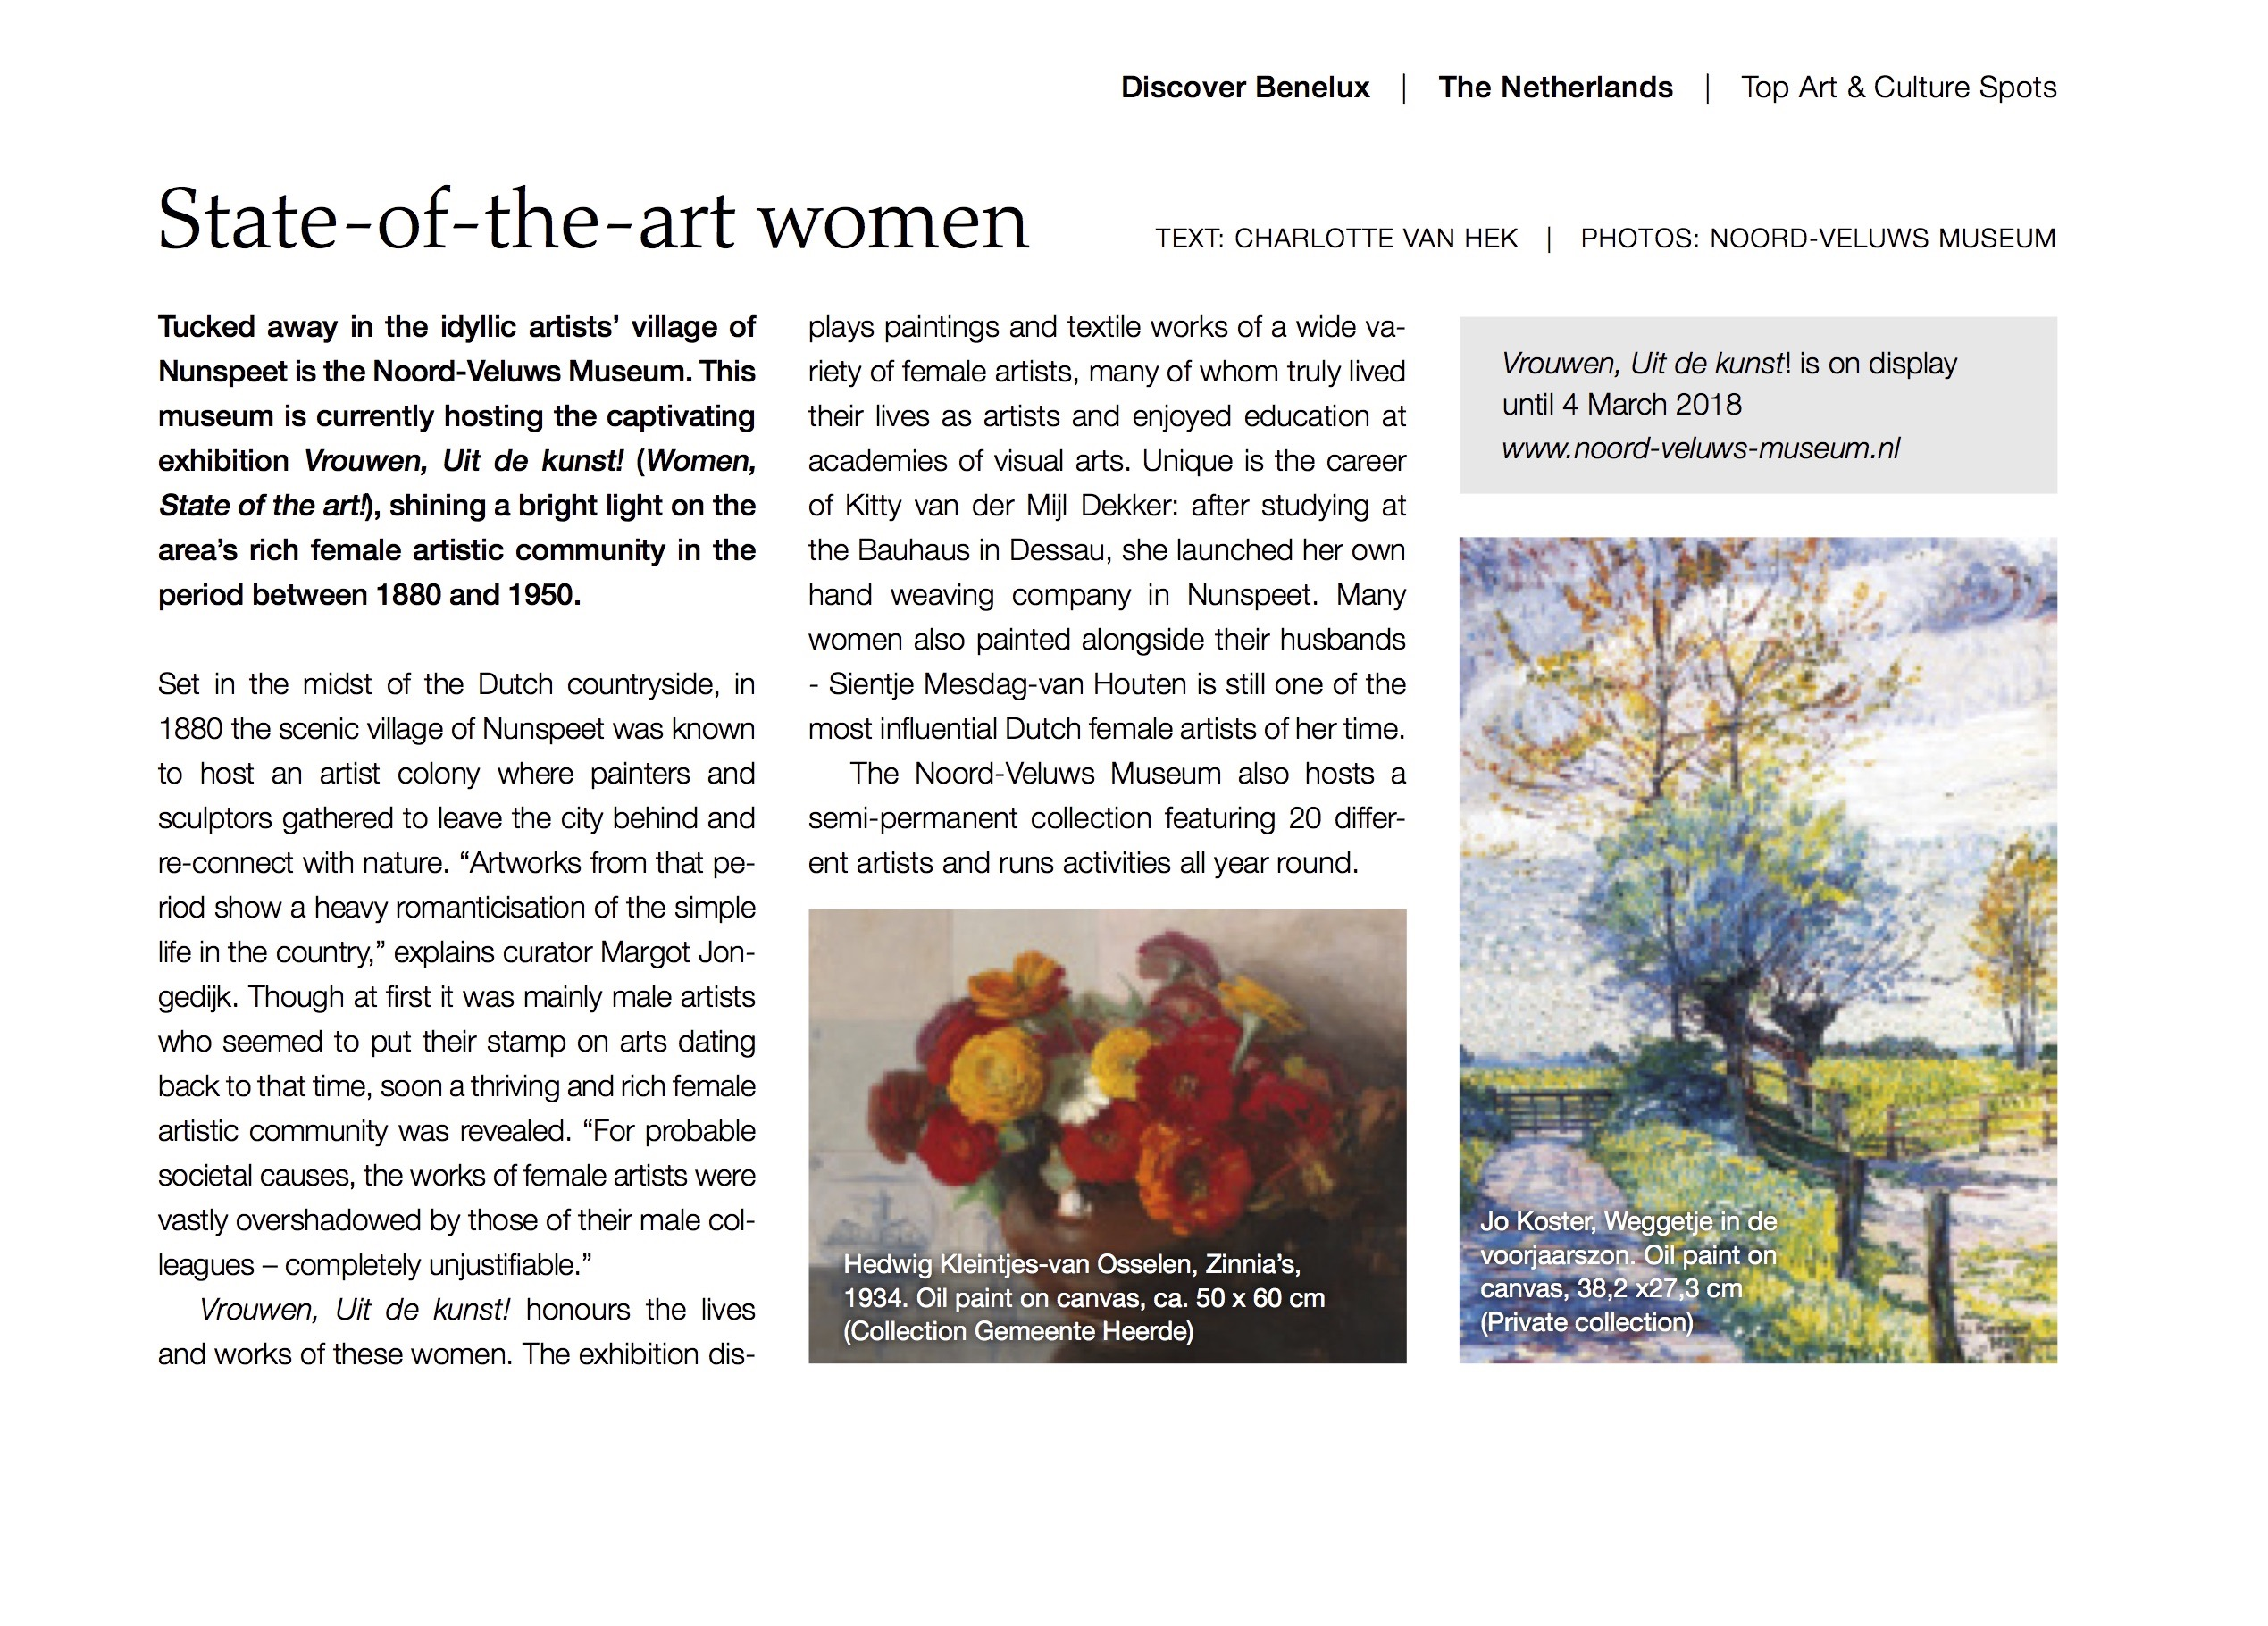 State-of-art-women